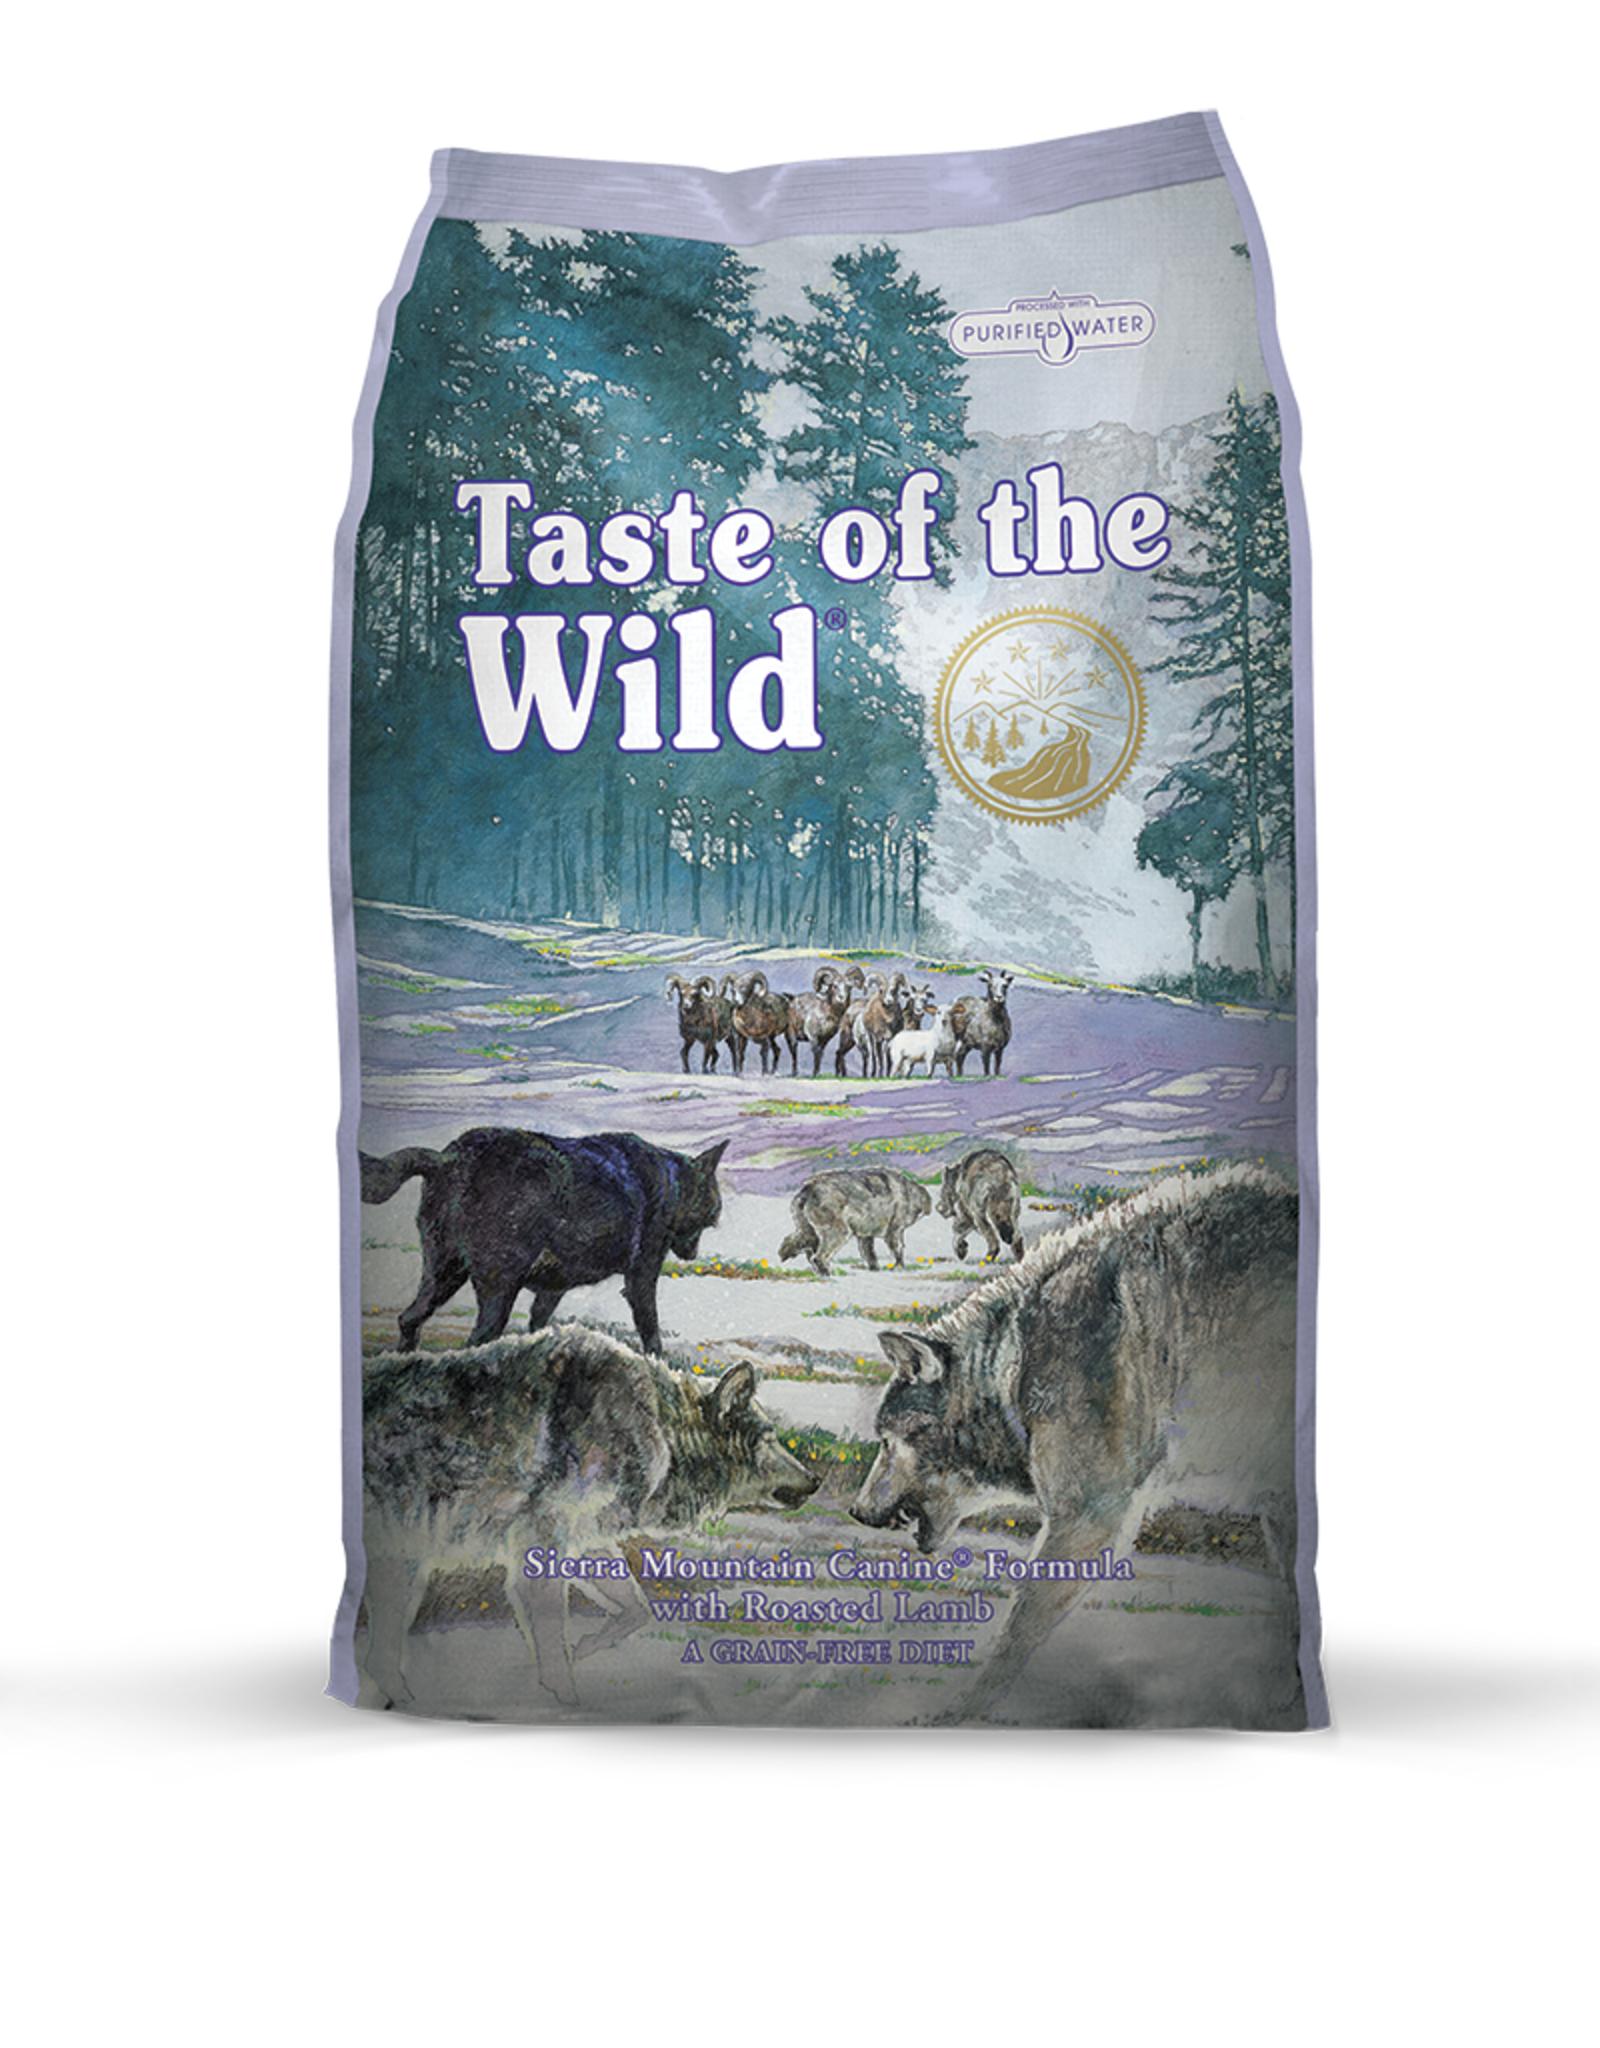 Taste of the Wild Taste of the Wild   Sierra Mountain Canine